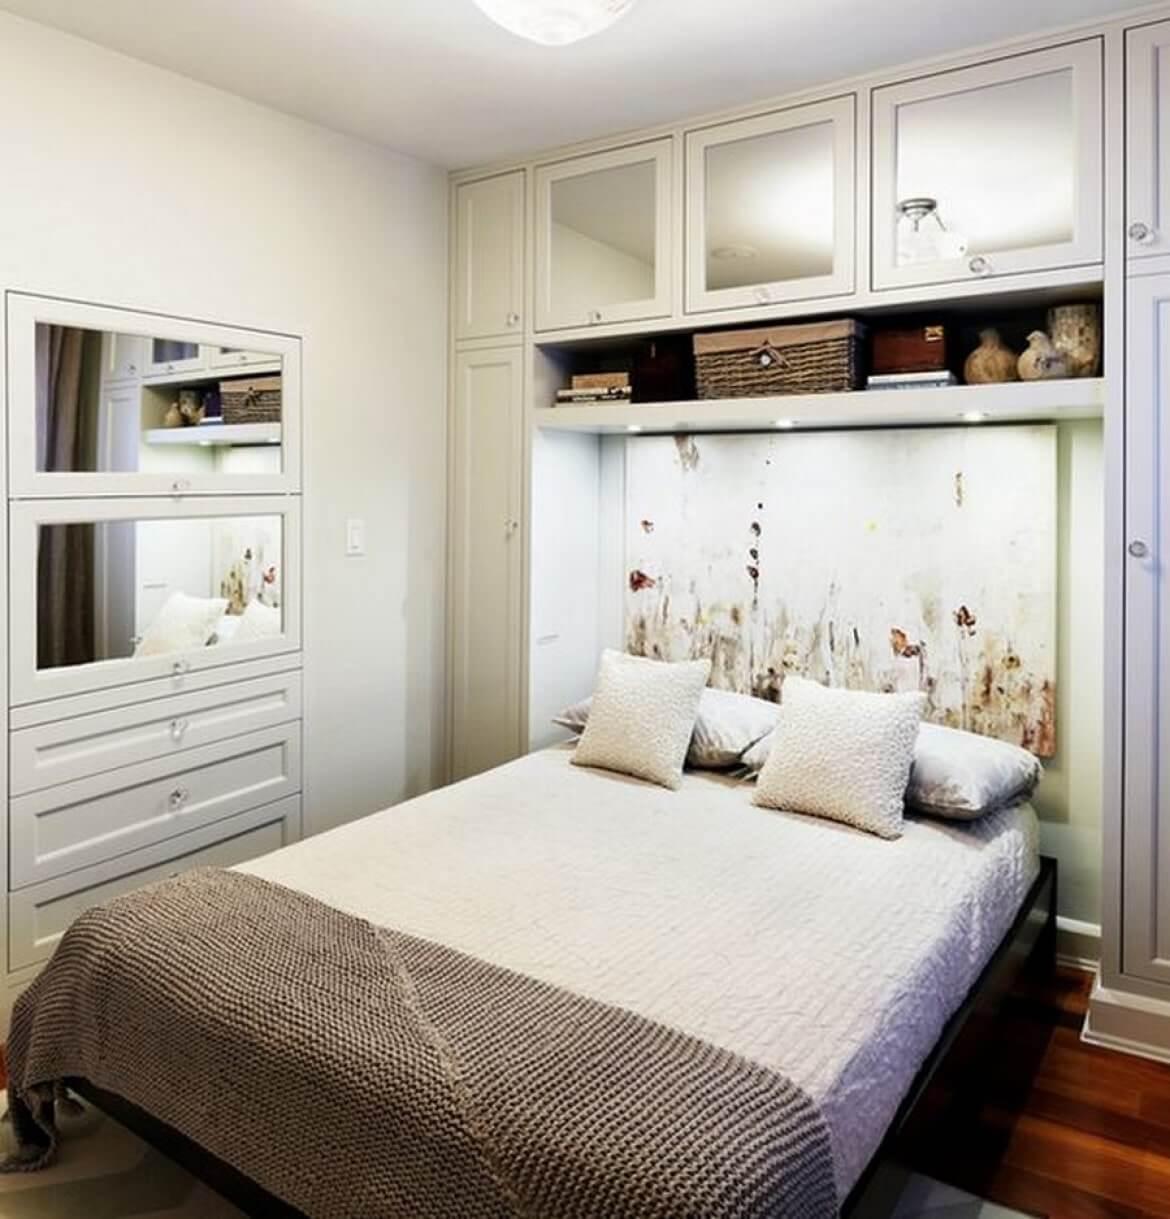 Узкая спальня 8 кв.м